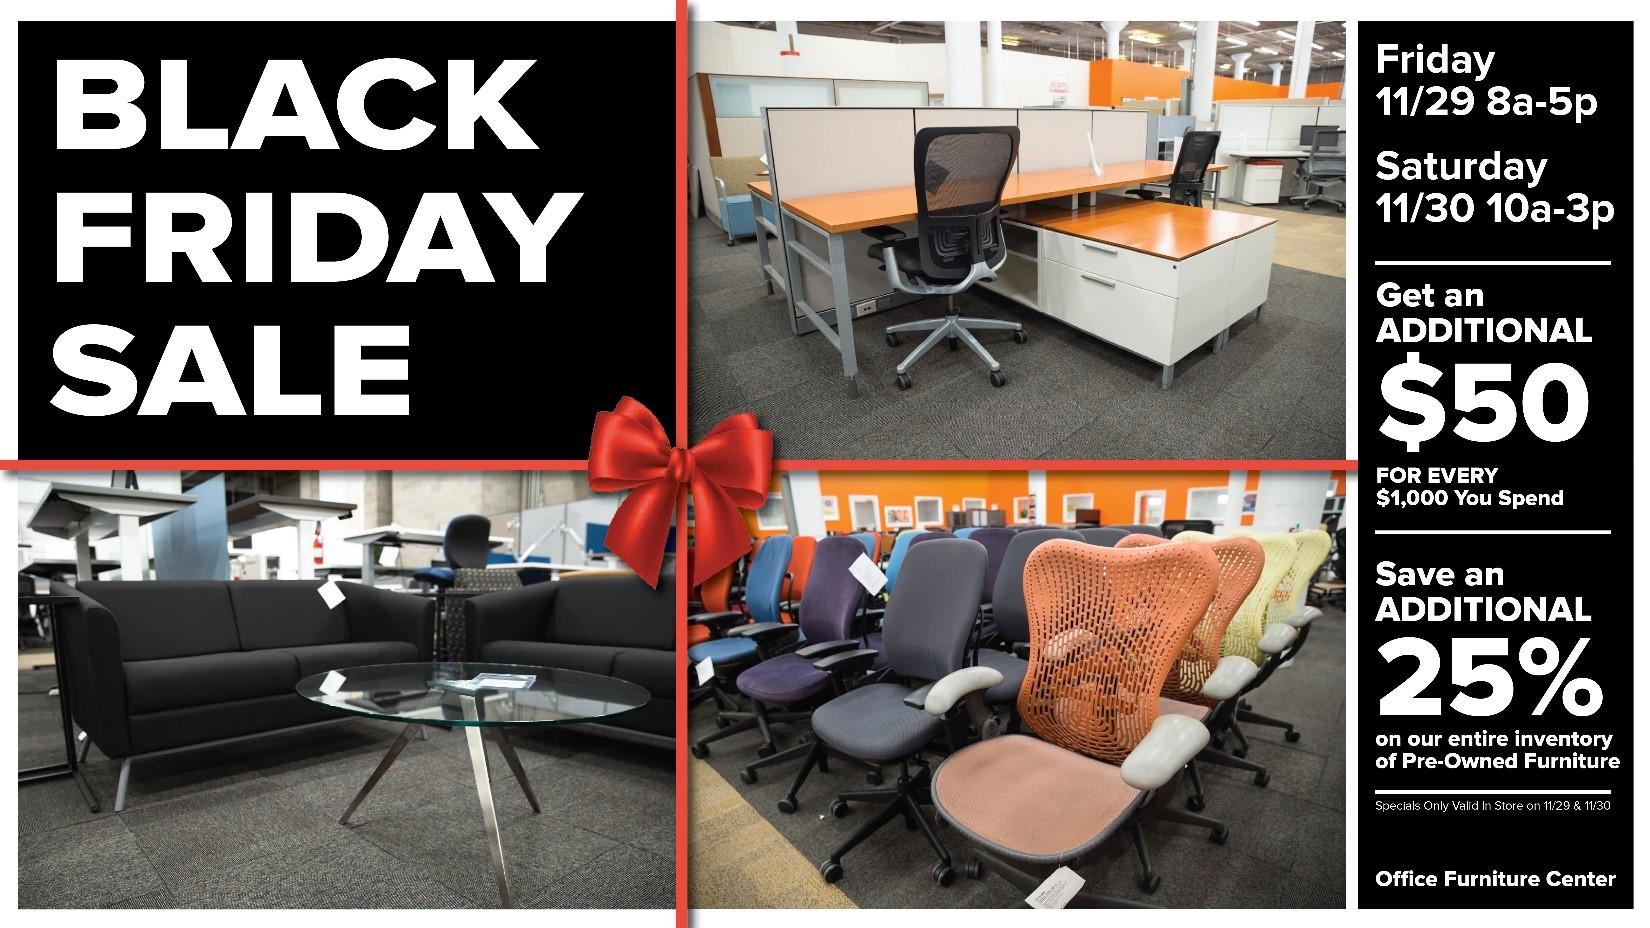 Office Furniture Center Black Friday Sale!